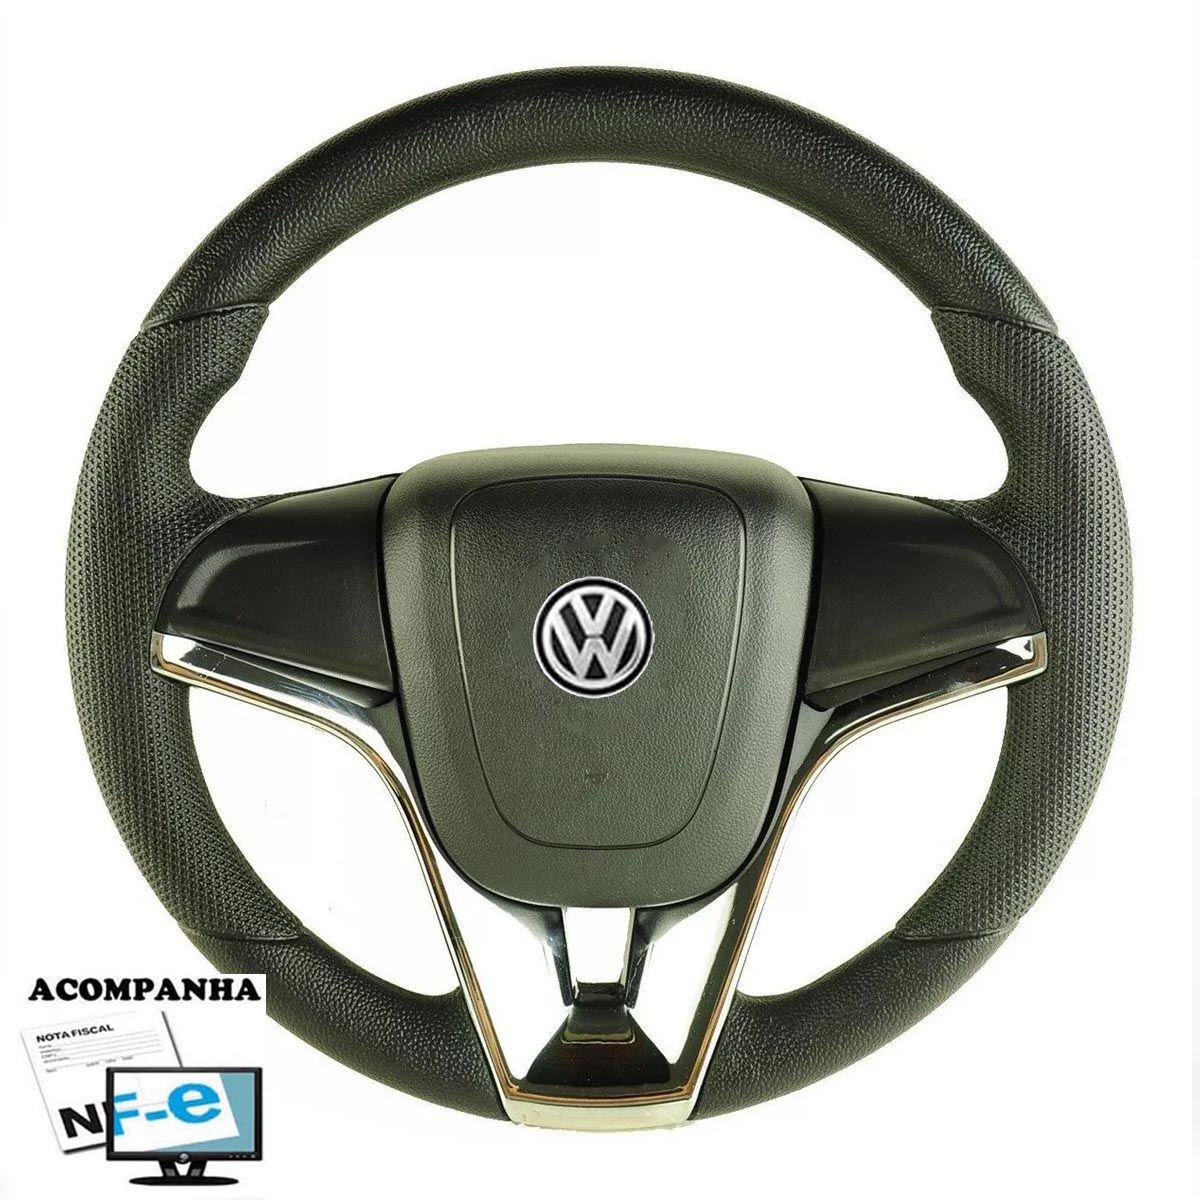 Volante Esportivo Cruze Gol Parati Saveiro Voyagen G1 G2 G3 G4 G5 Golf Fusca Brasilia Polo Kombi Santana Passat Volkswagen + Cubo Vw